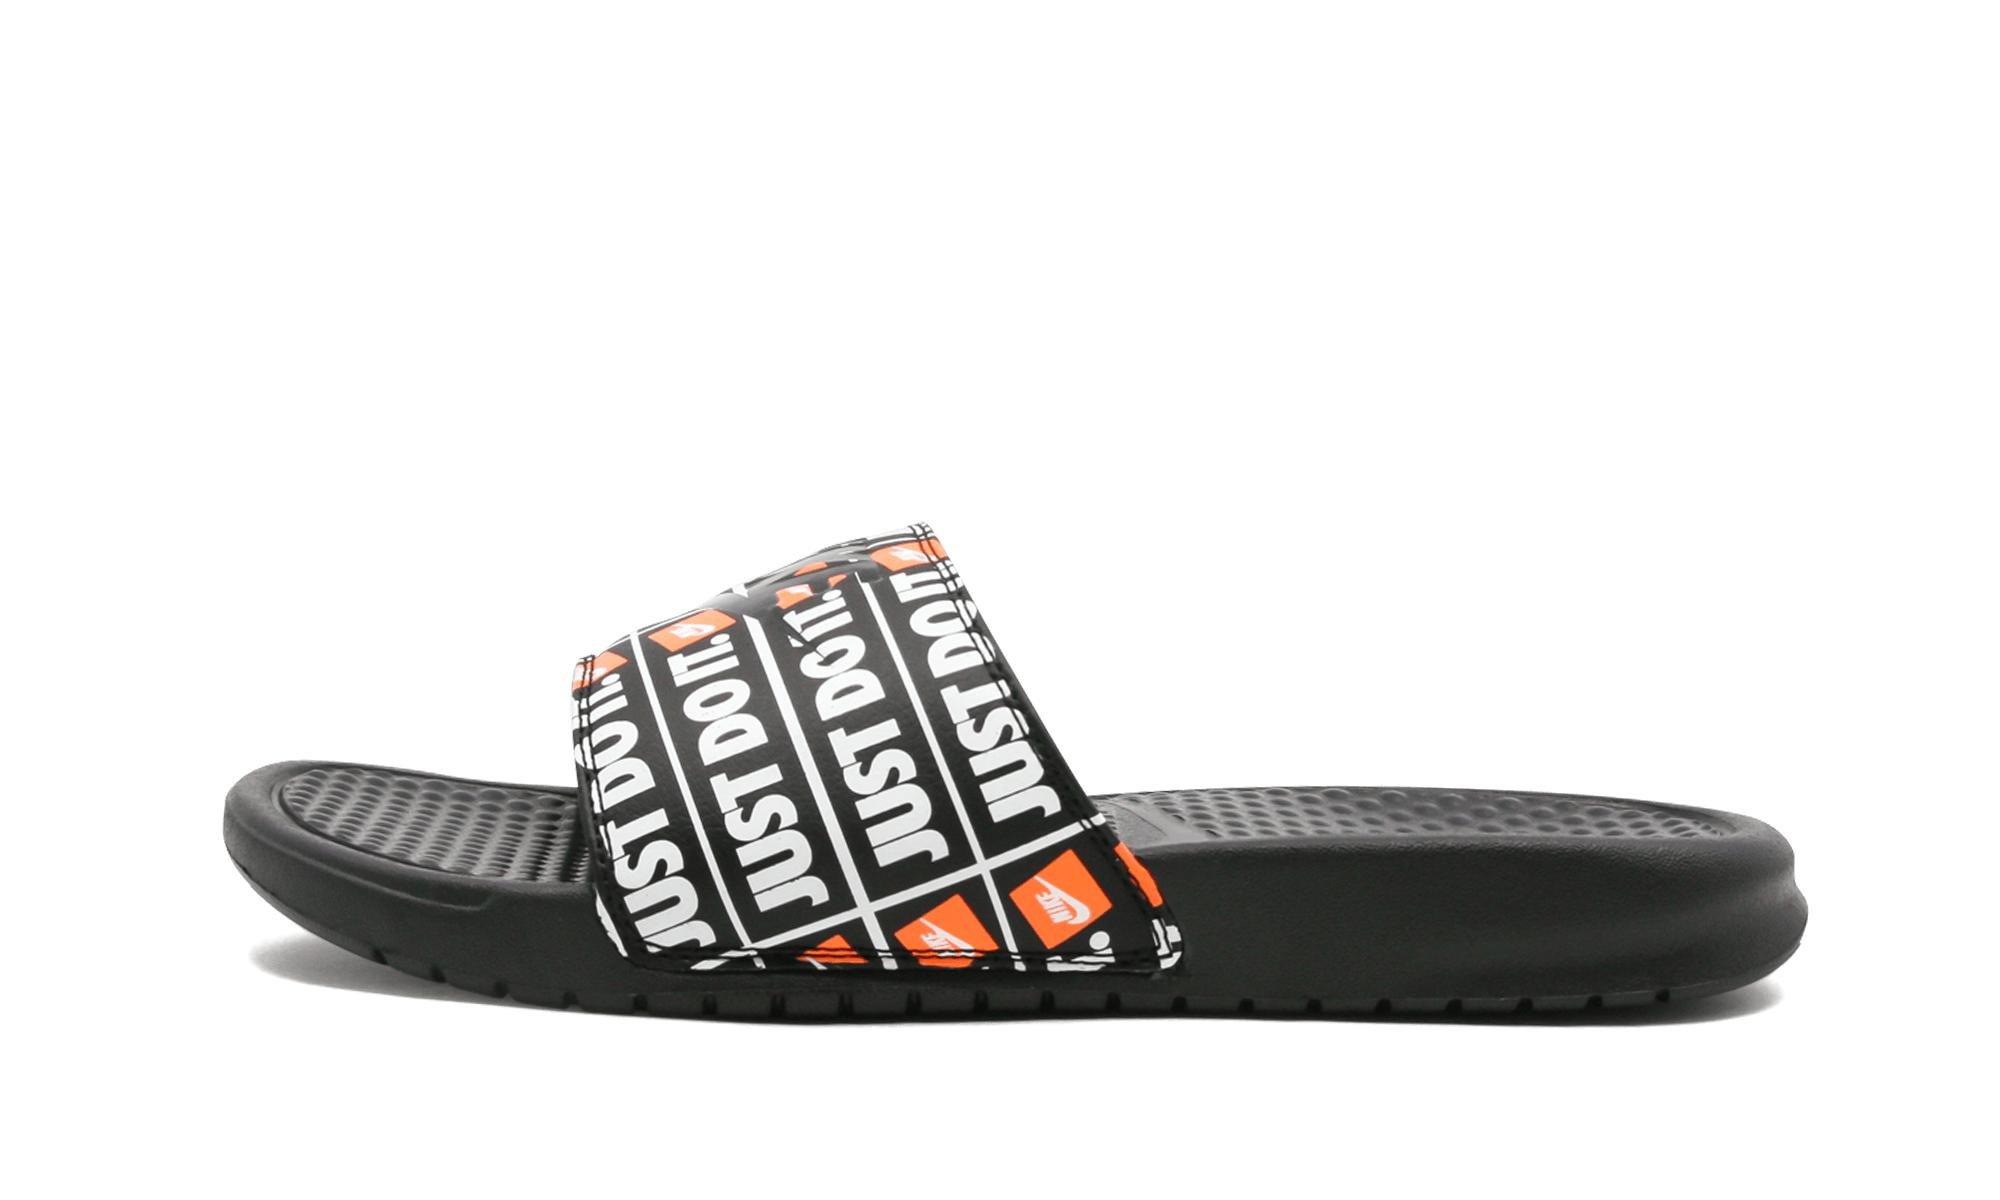 d26e9a9558afac Nike Benassi Jdi Print in Black for Men - Save 40.0% - Lyst